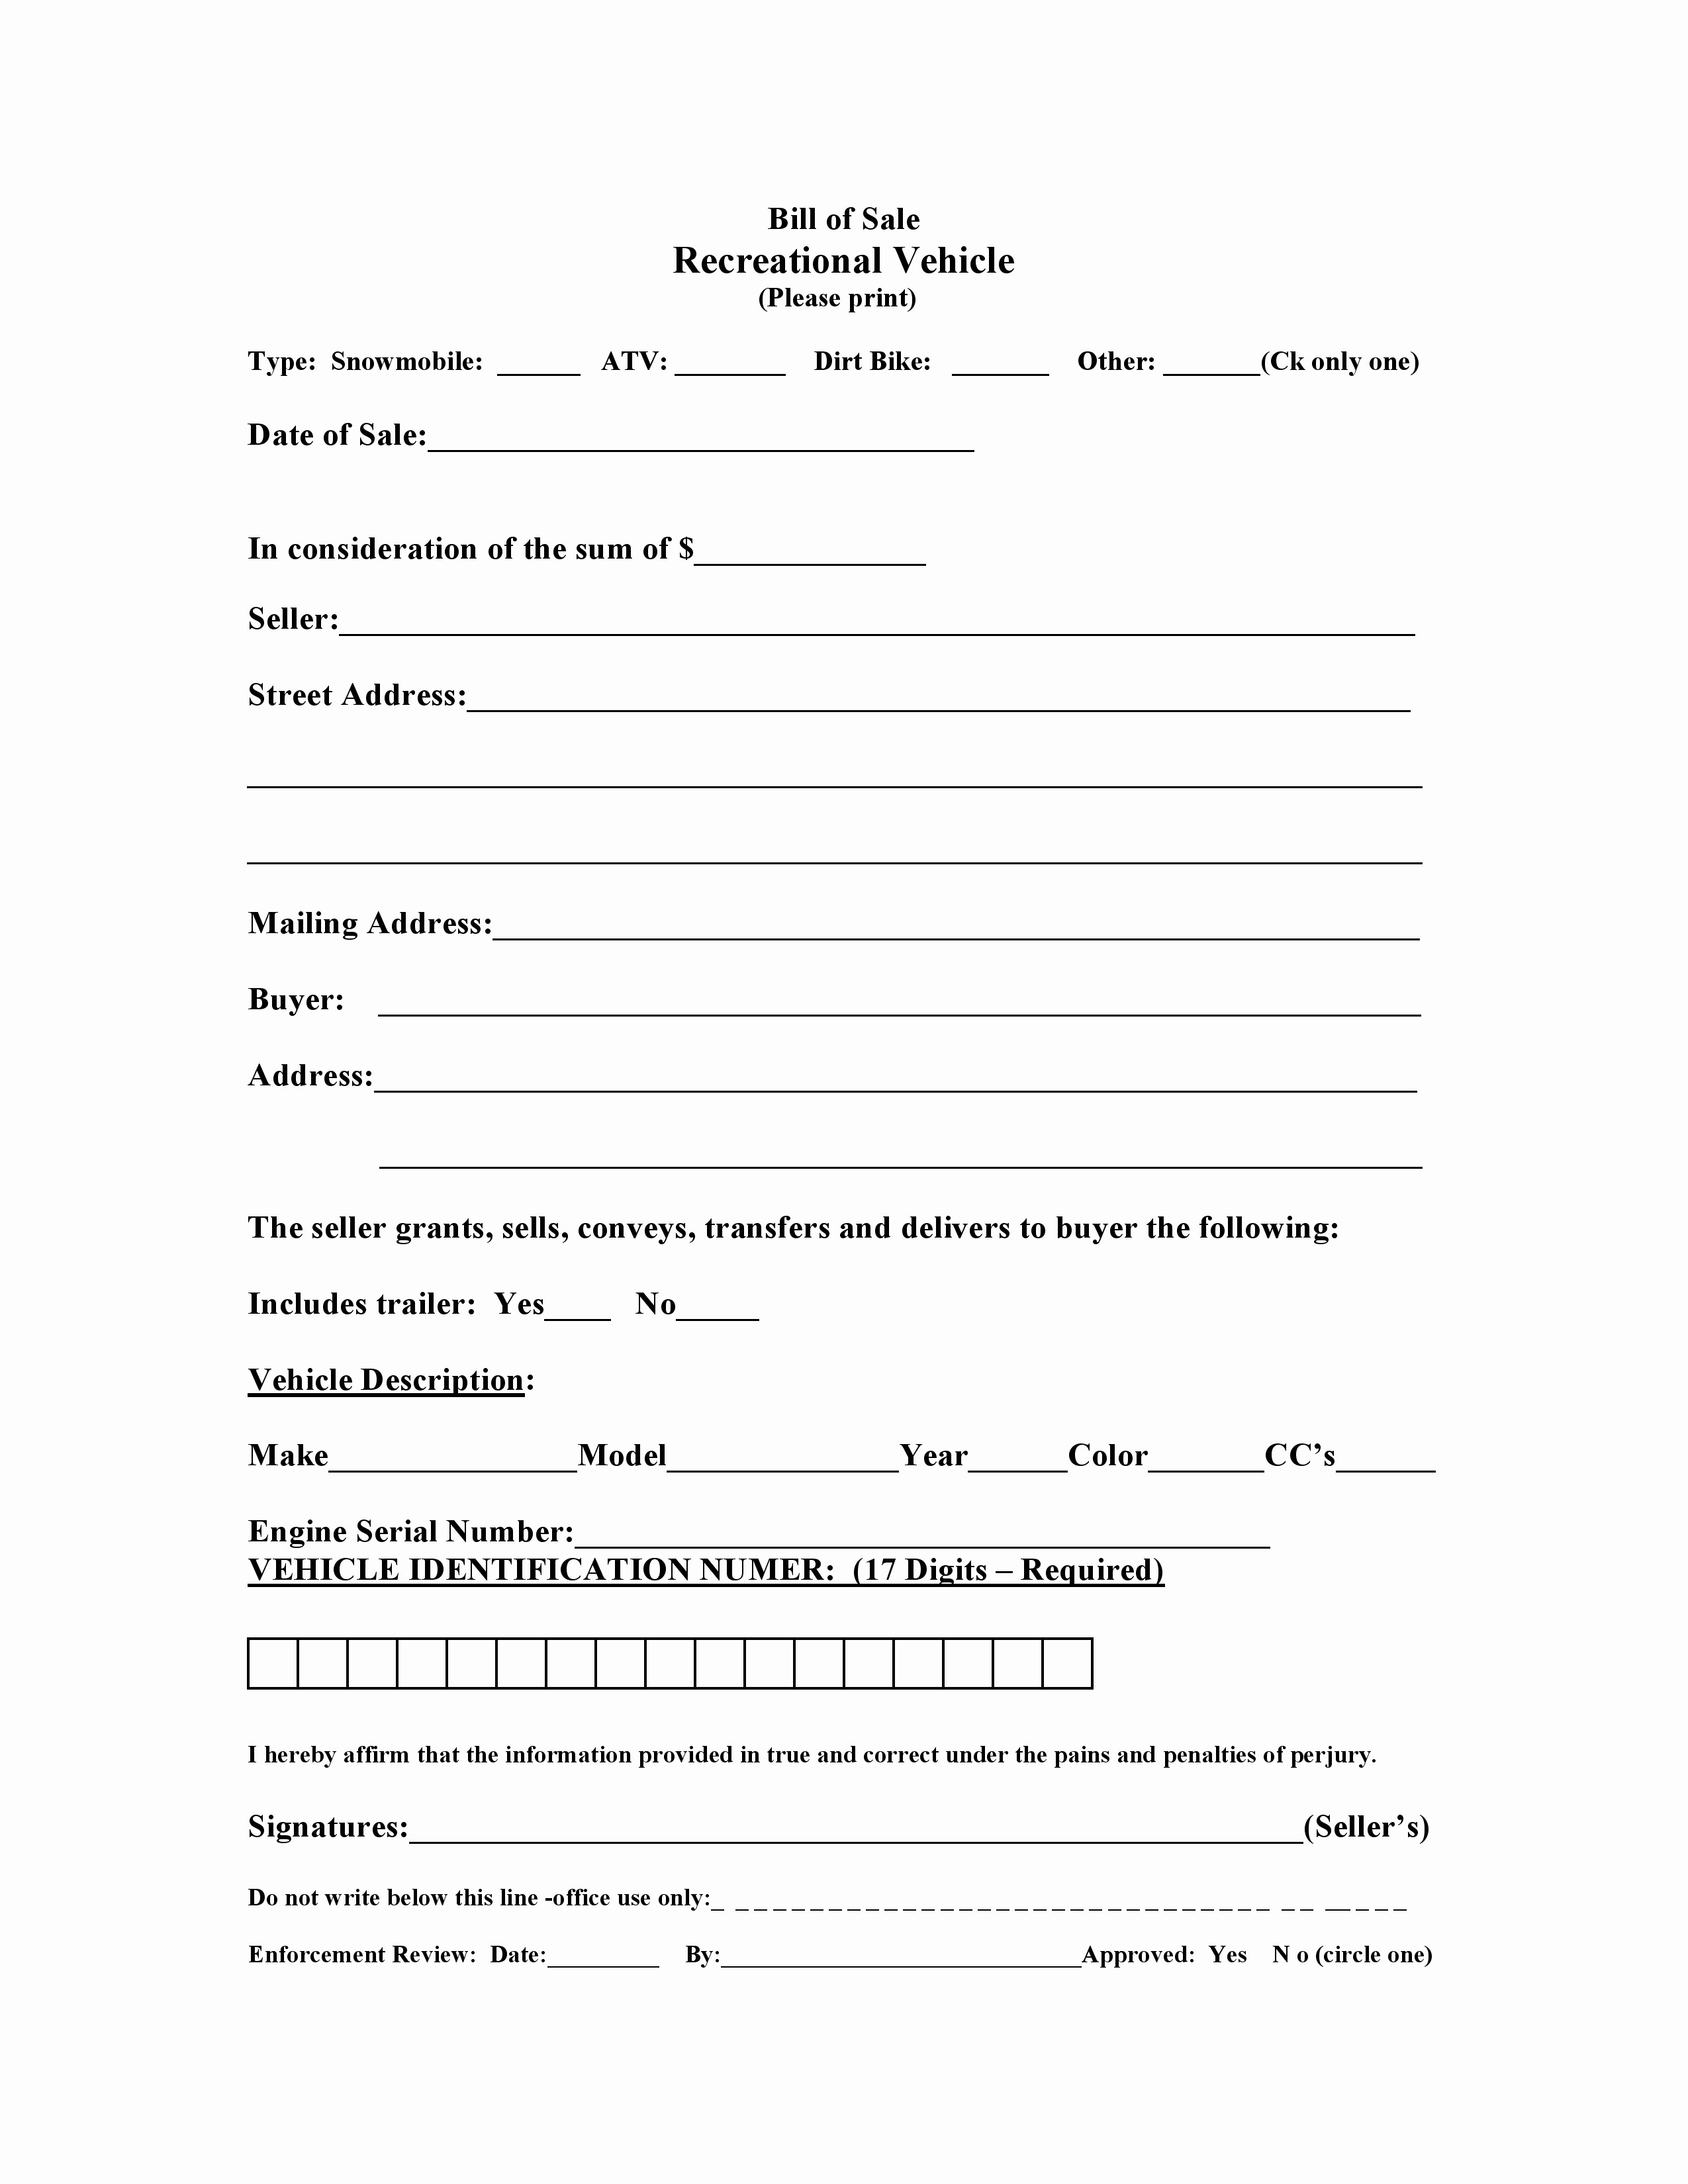 Auto Bill Of Sale Massachusetts Fresh Free Massachusetts Recreational Vessel Vehicle Bill Of